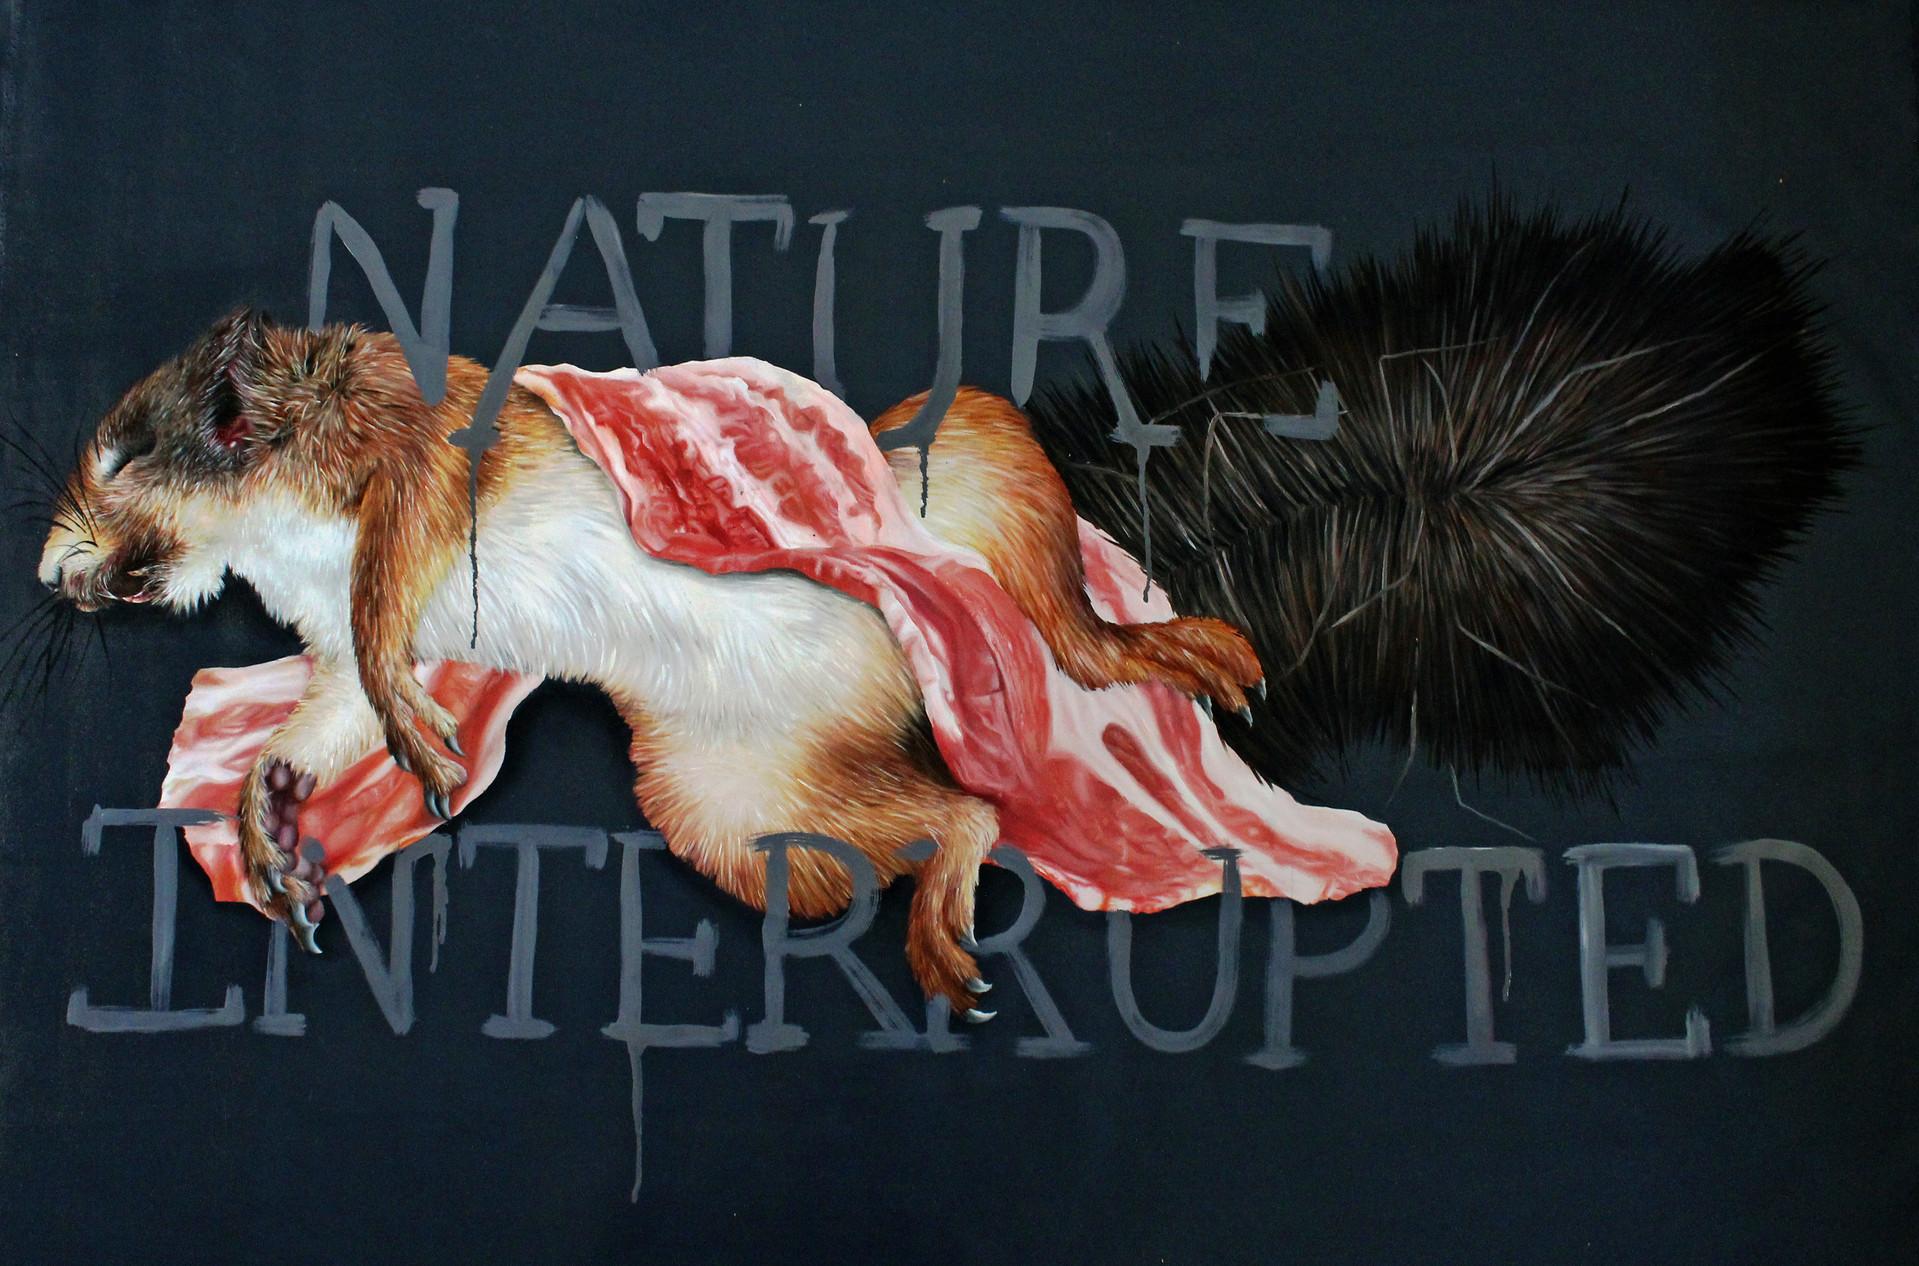 'Nature Interrupted'